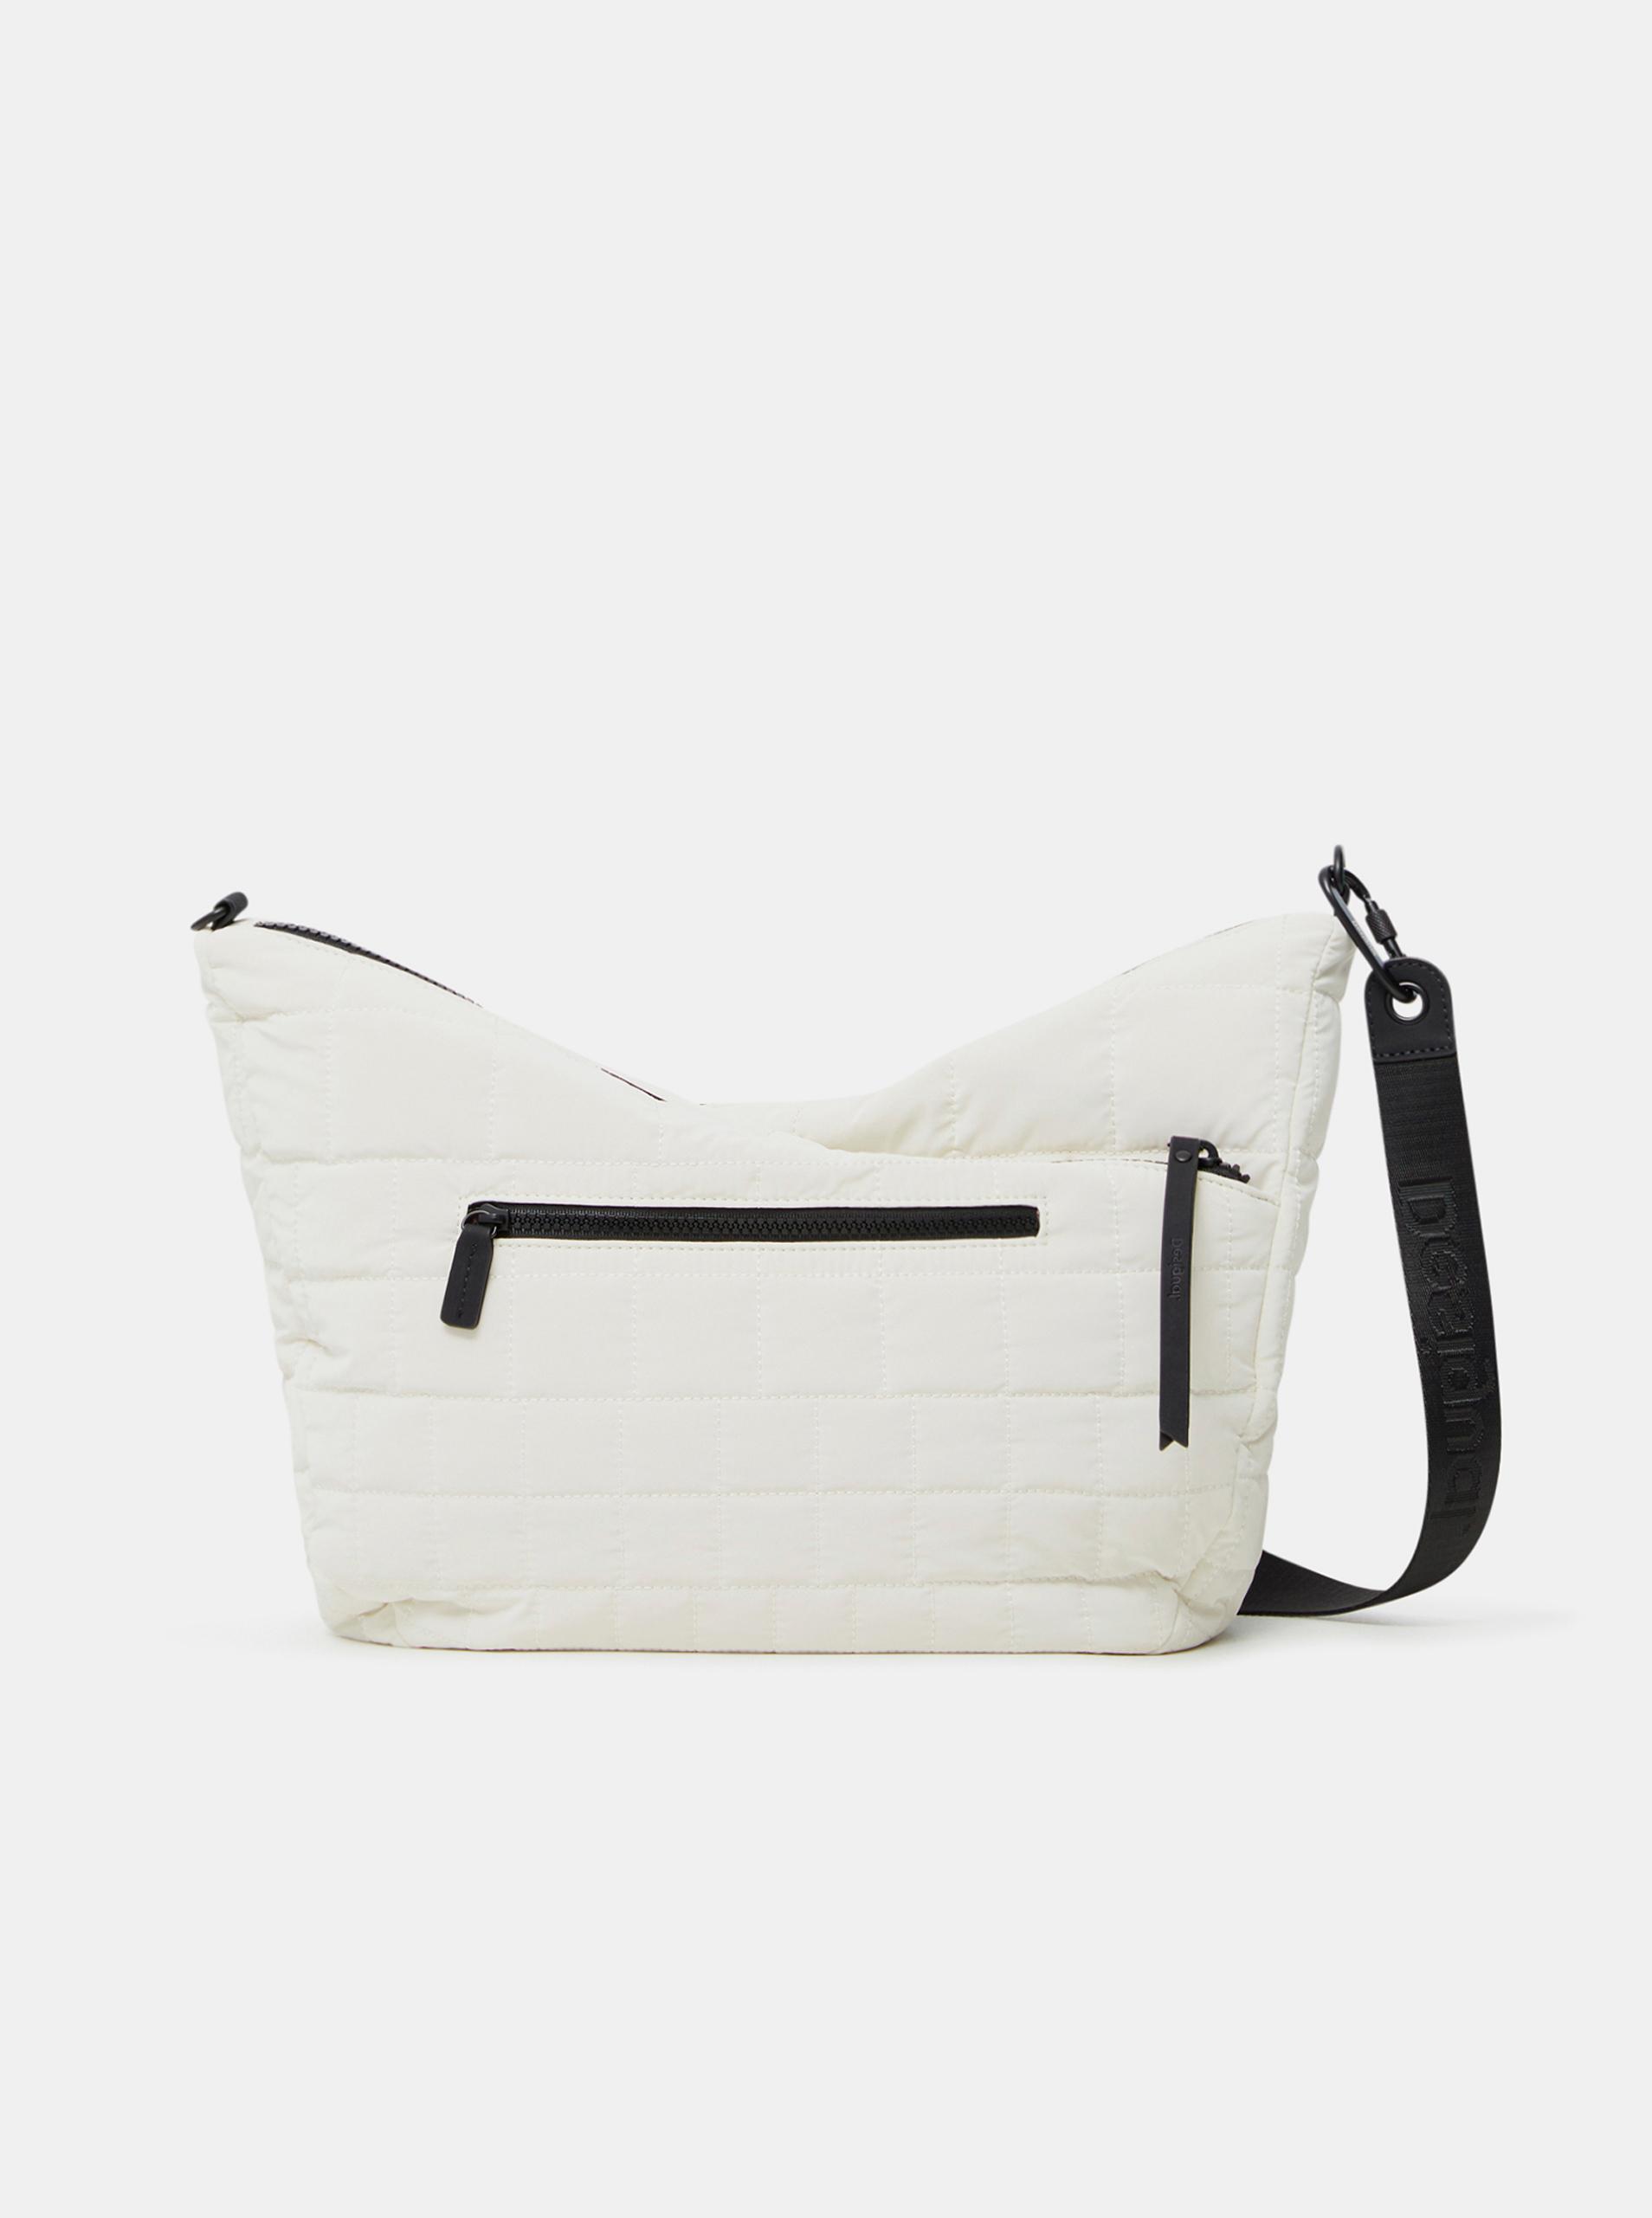 Desigual biały torebka COcoa Harry 2.0 Maxy